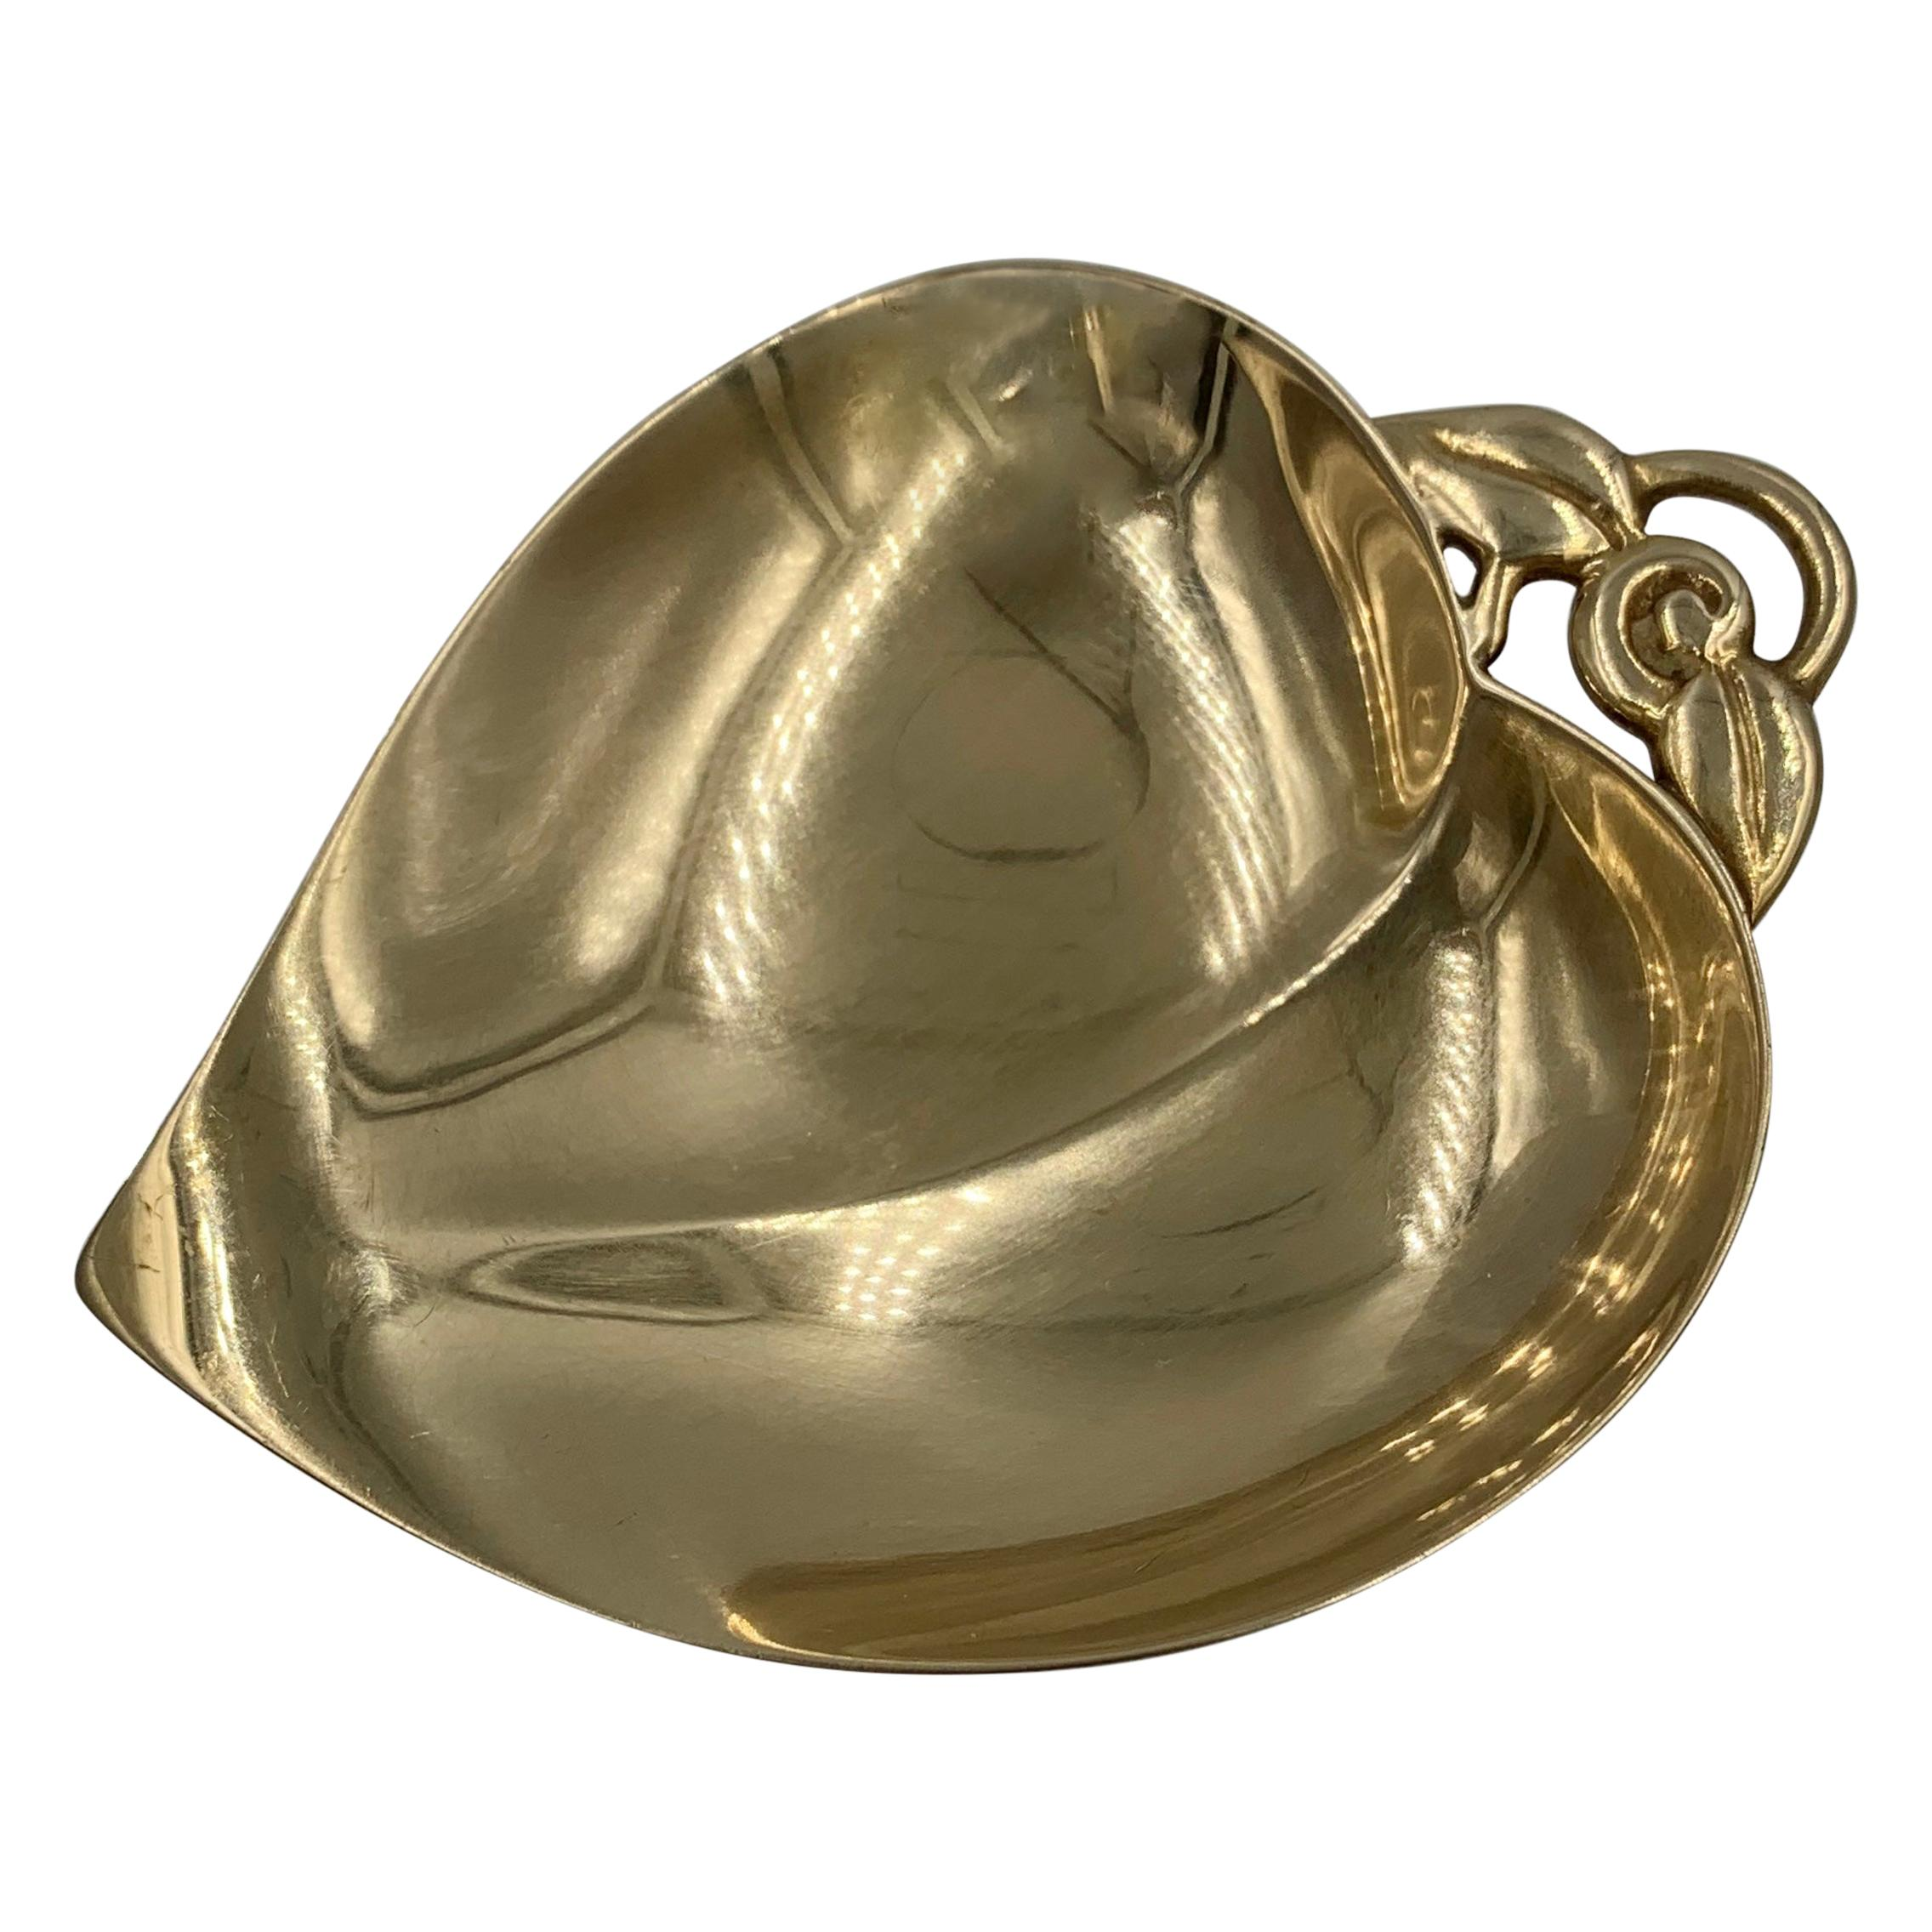 Tiffany & Co. Antique 14 Karat Gold Bowl Circa 1920 Leaf Motif Rare